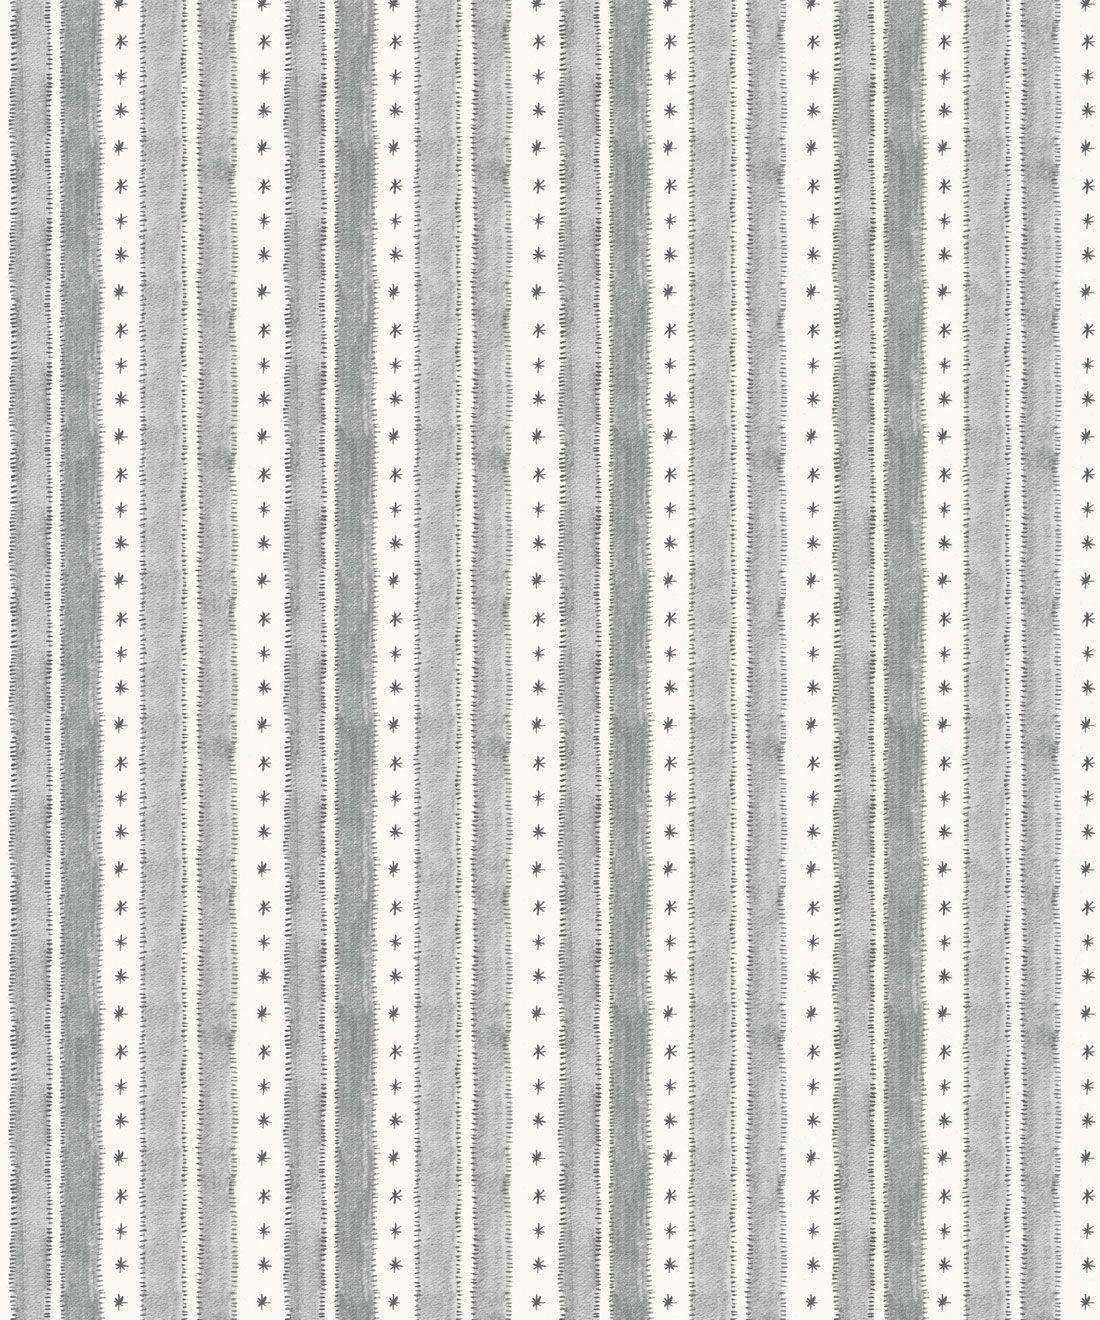 Star Stripe Wallpaper • Charcoal • Swatch